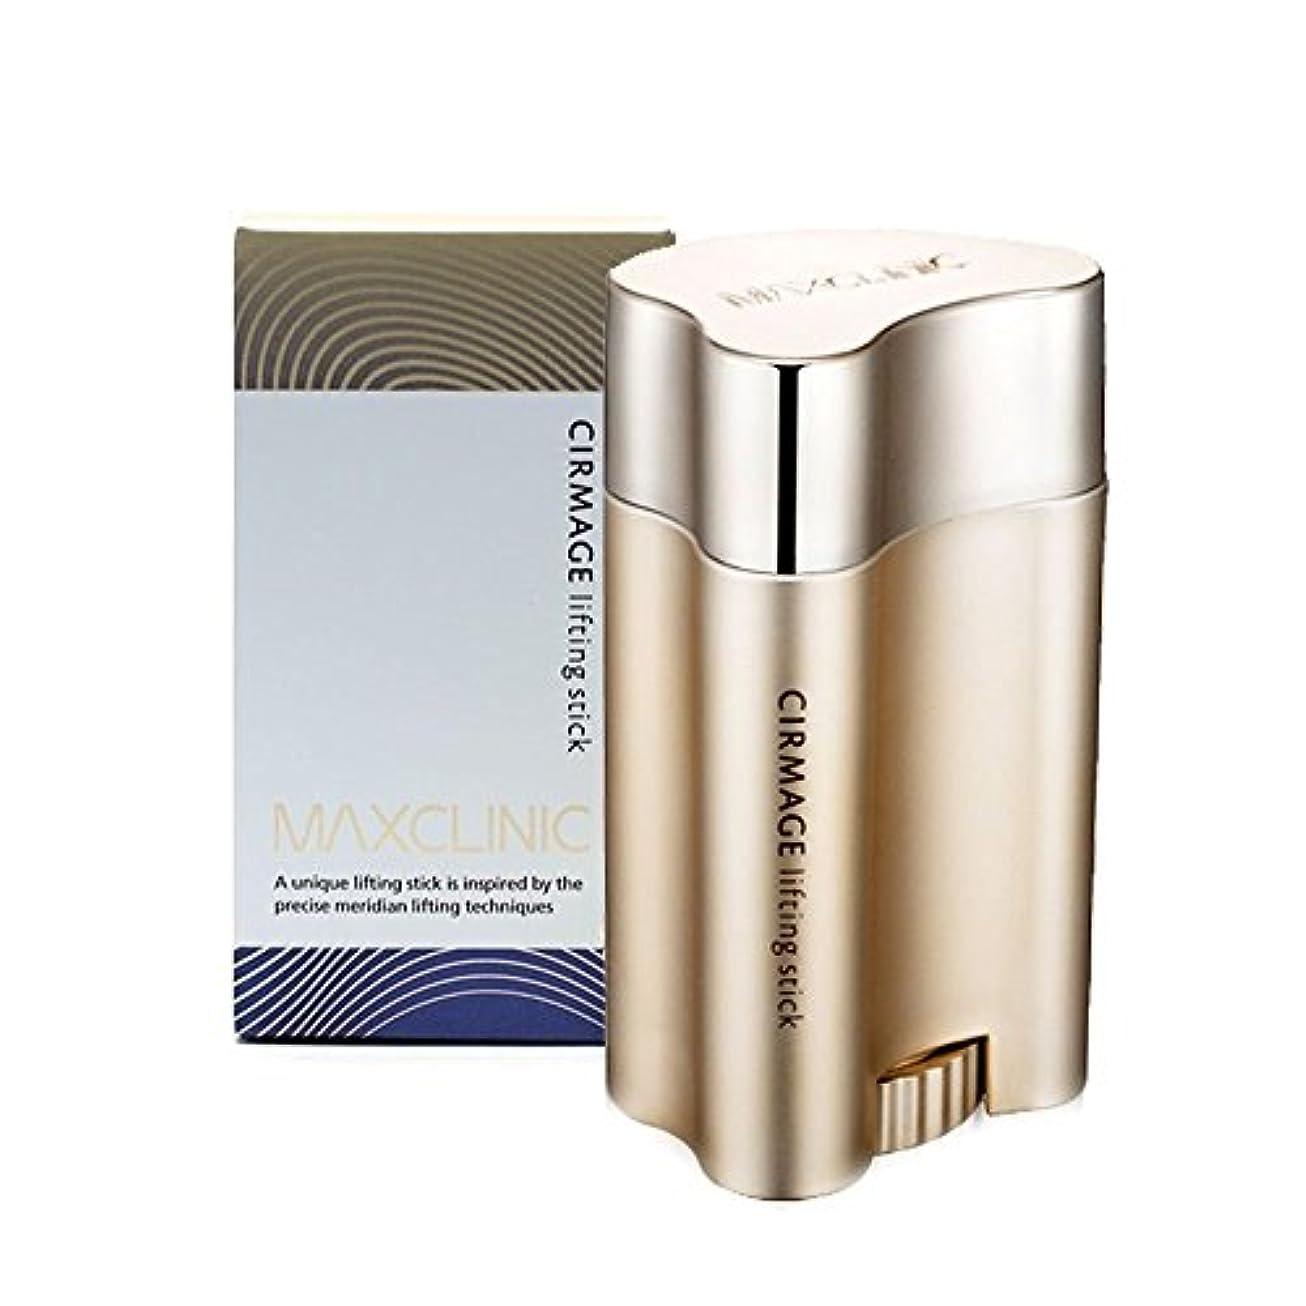 MAXCLINIC マックスクリニック サーメージ リフティング スティック 23g(Cirmage Lifting Stick 23g)/Direct from Korea/w free Gift Sample [並行輸入品]